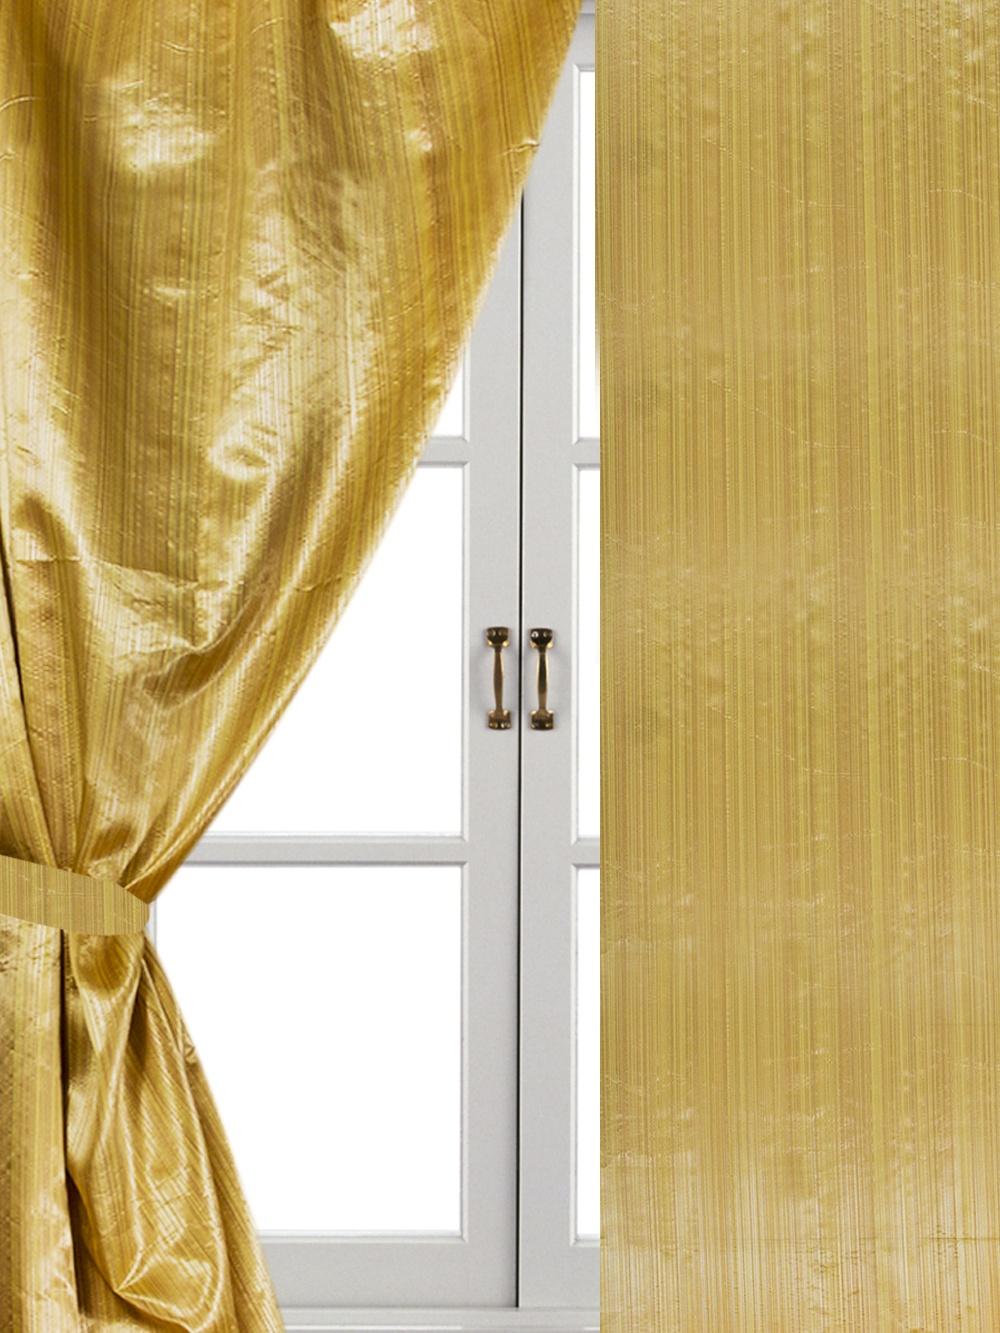 Шторы комнатные Айлант ОБ15 шторы homedeco нитяные шторы яркие кольца